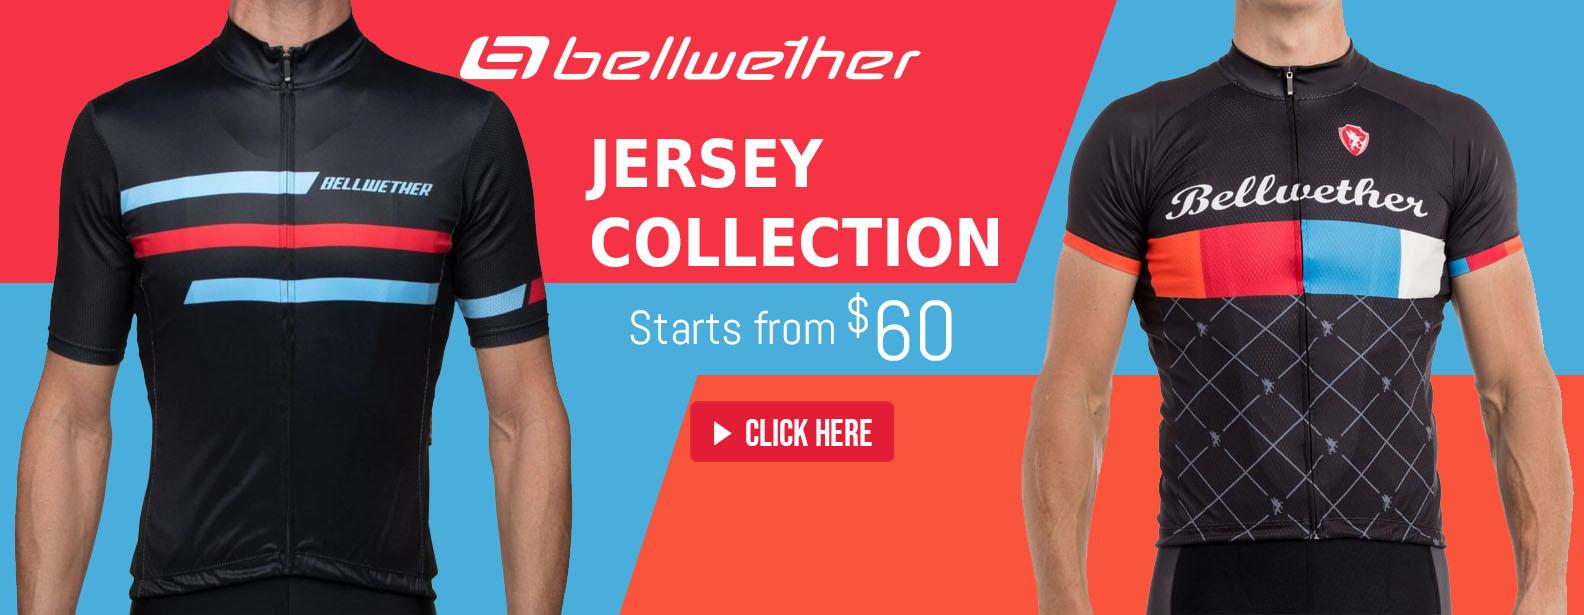 Buy Bellwether Apparel